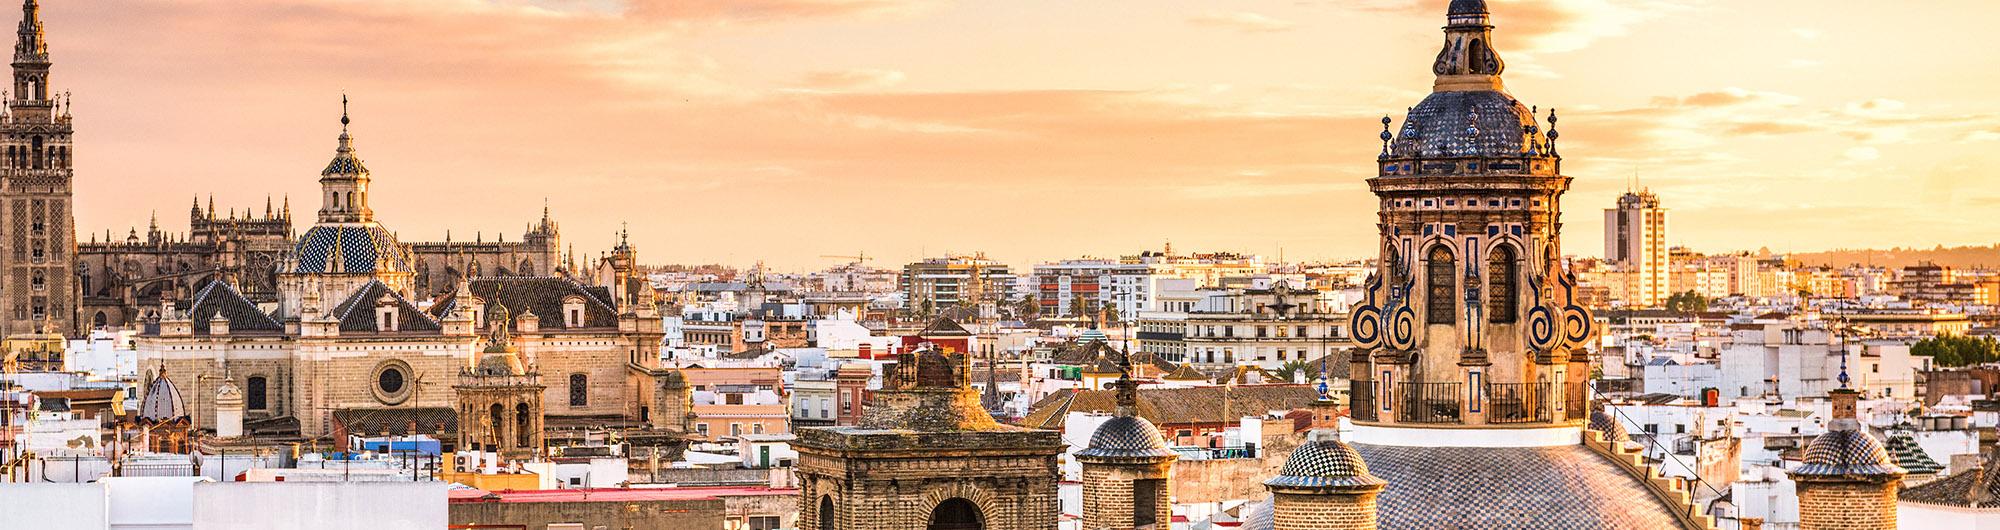 _KINEXPERIENCE_2019_Sevilla